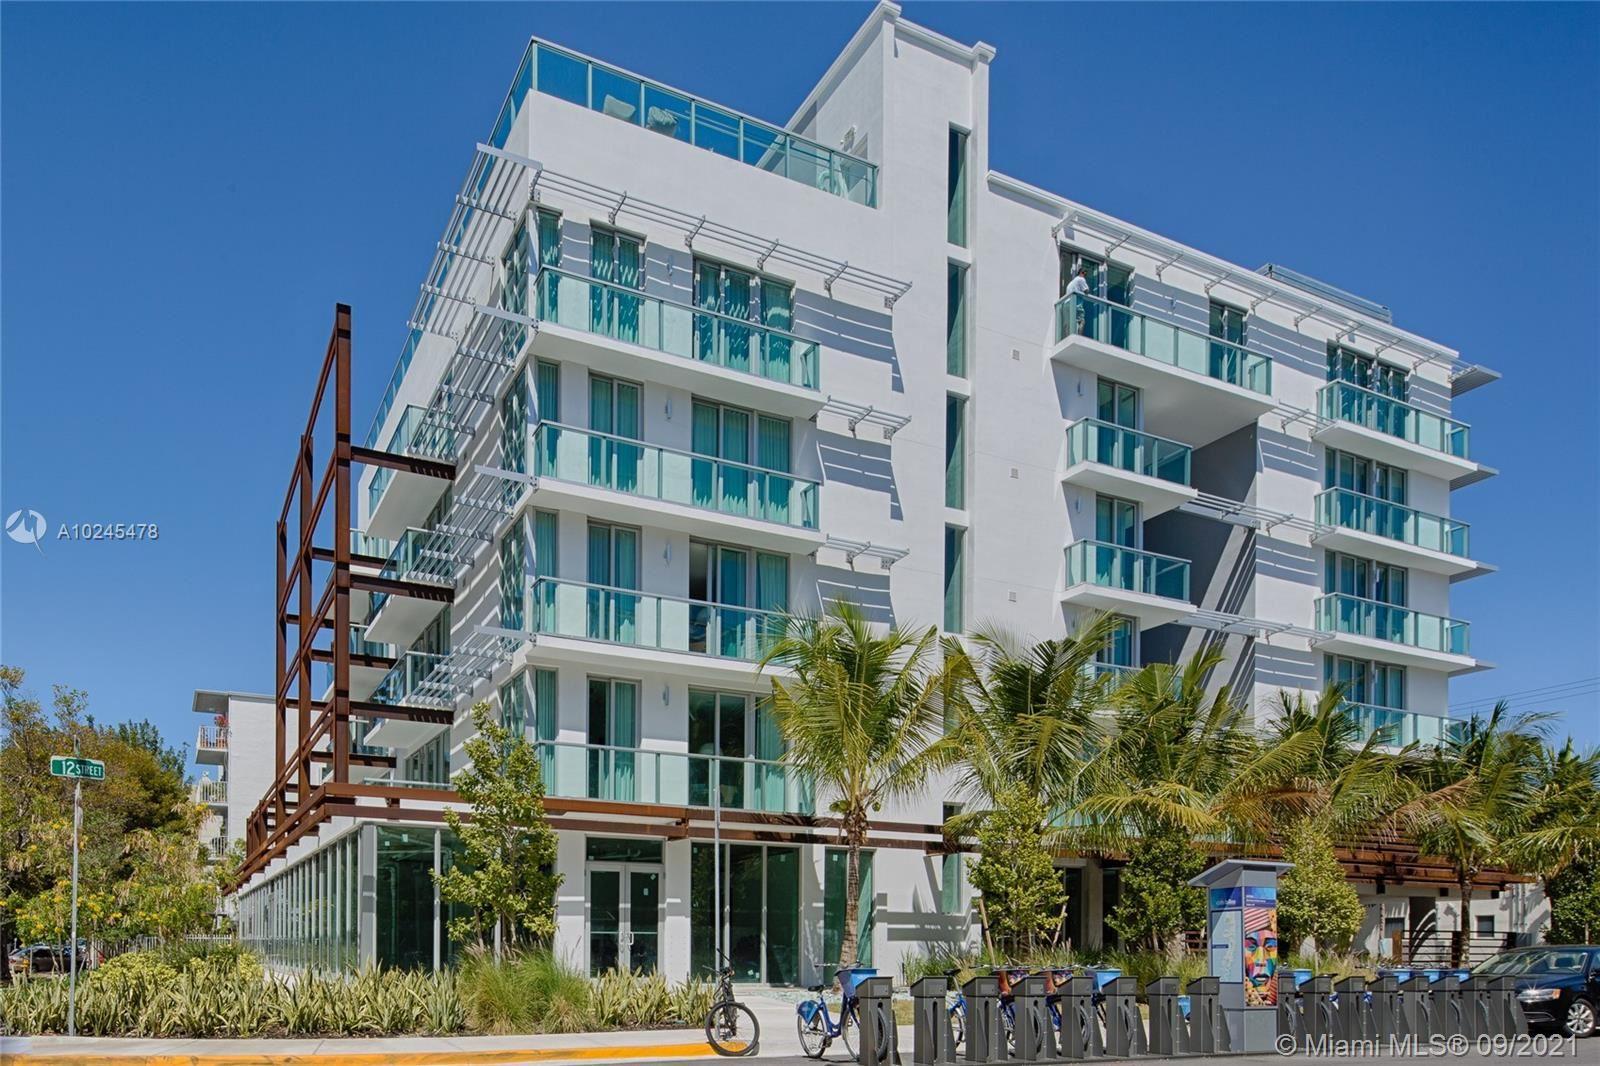 1215 West Ave #202, Miami Beach, FL 33139 - #: A10245478